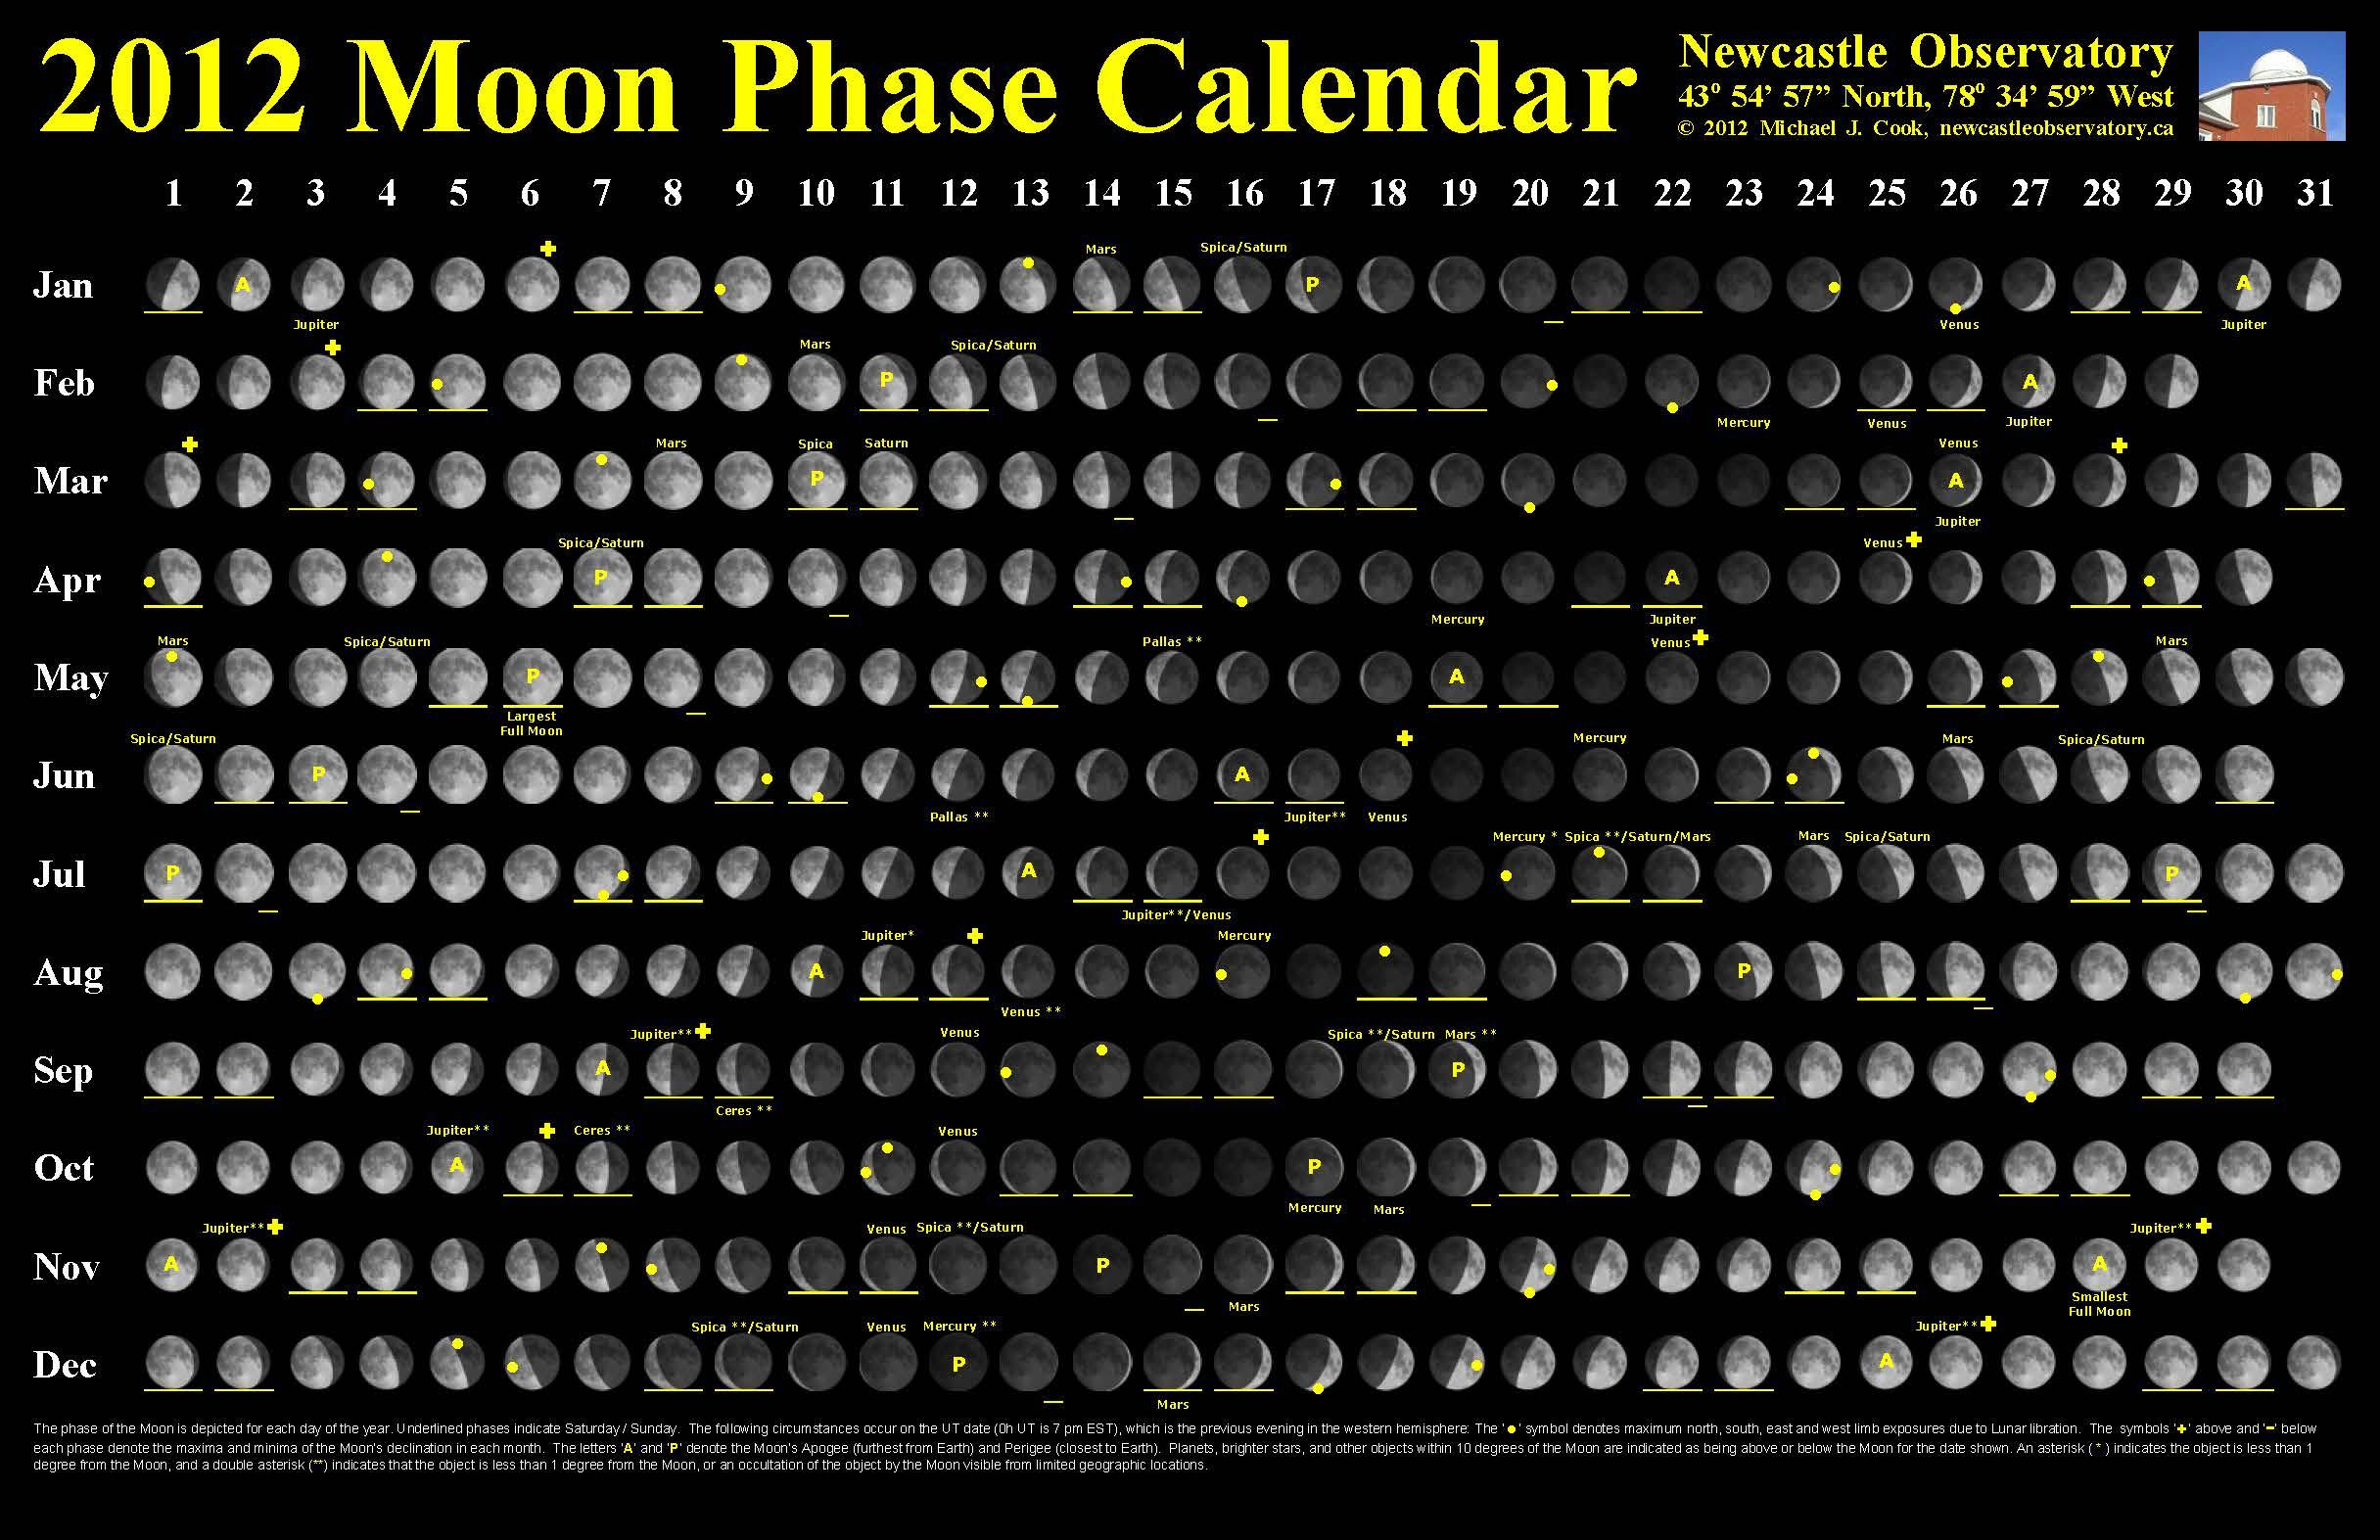 2012 Moon Phase Calendar Update Newcastle Observatory